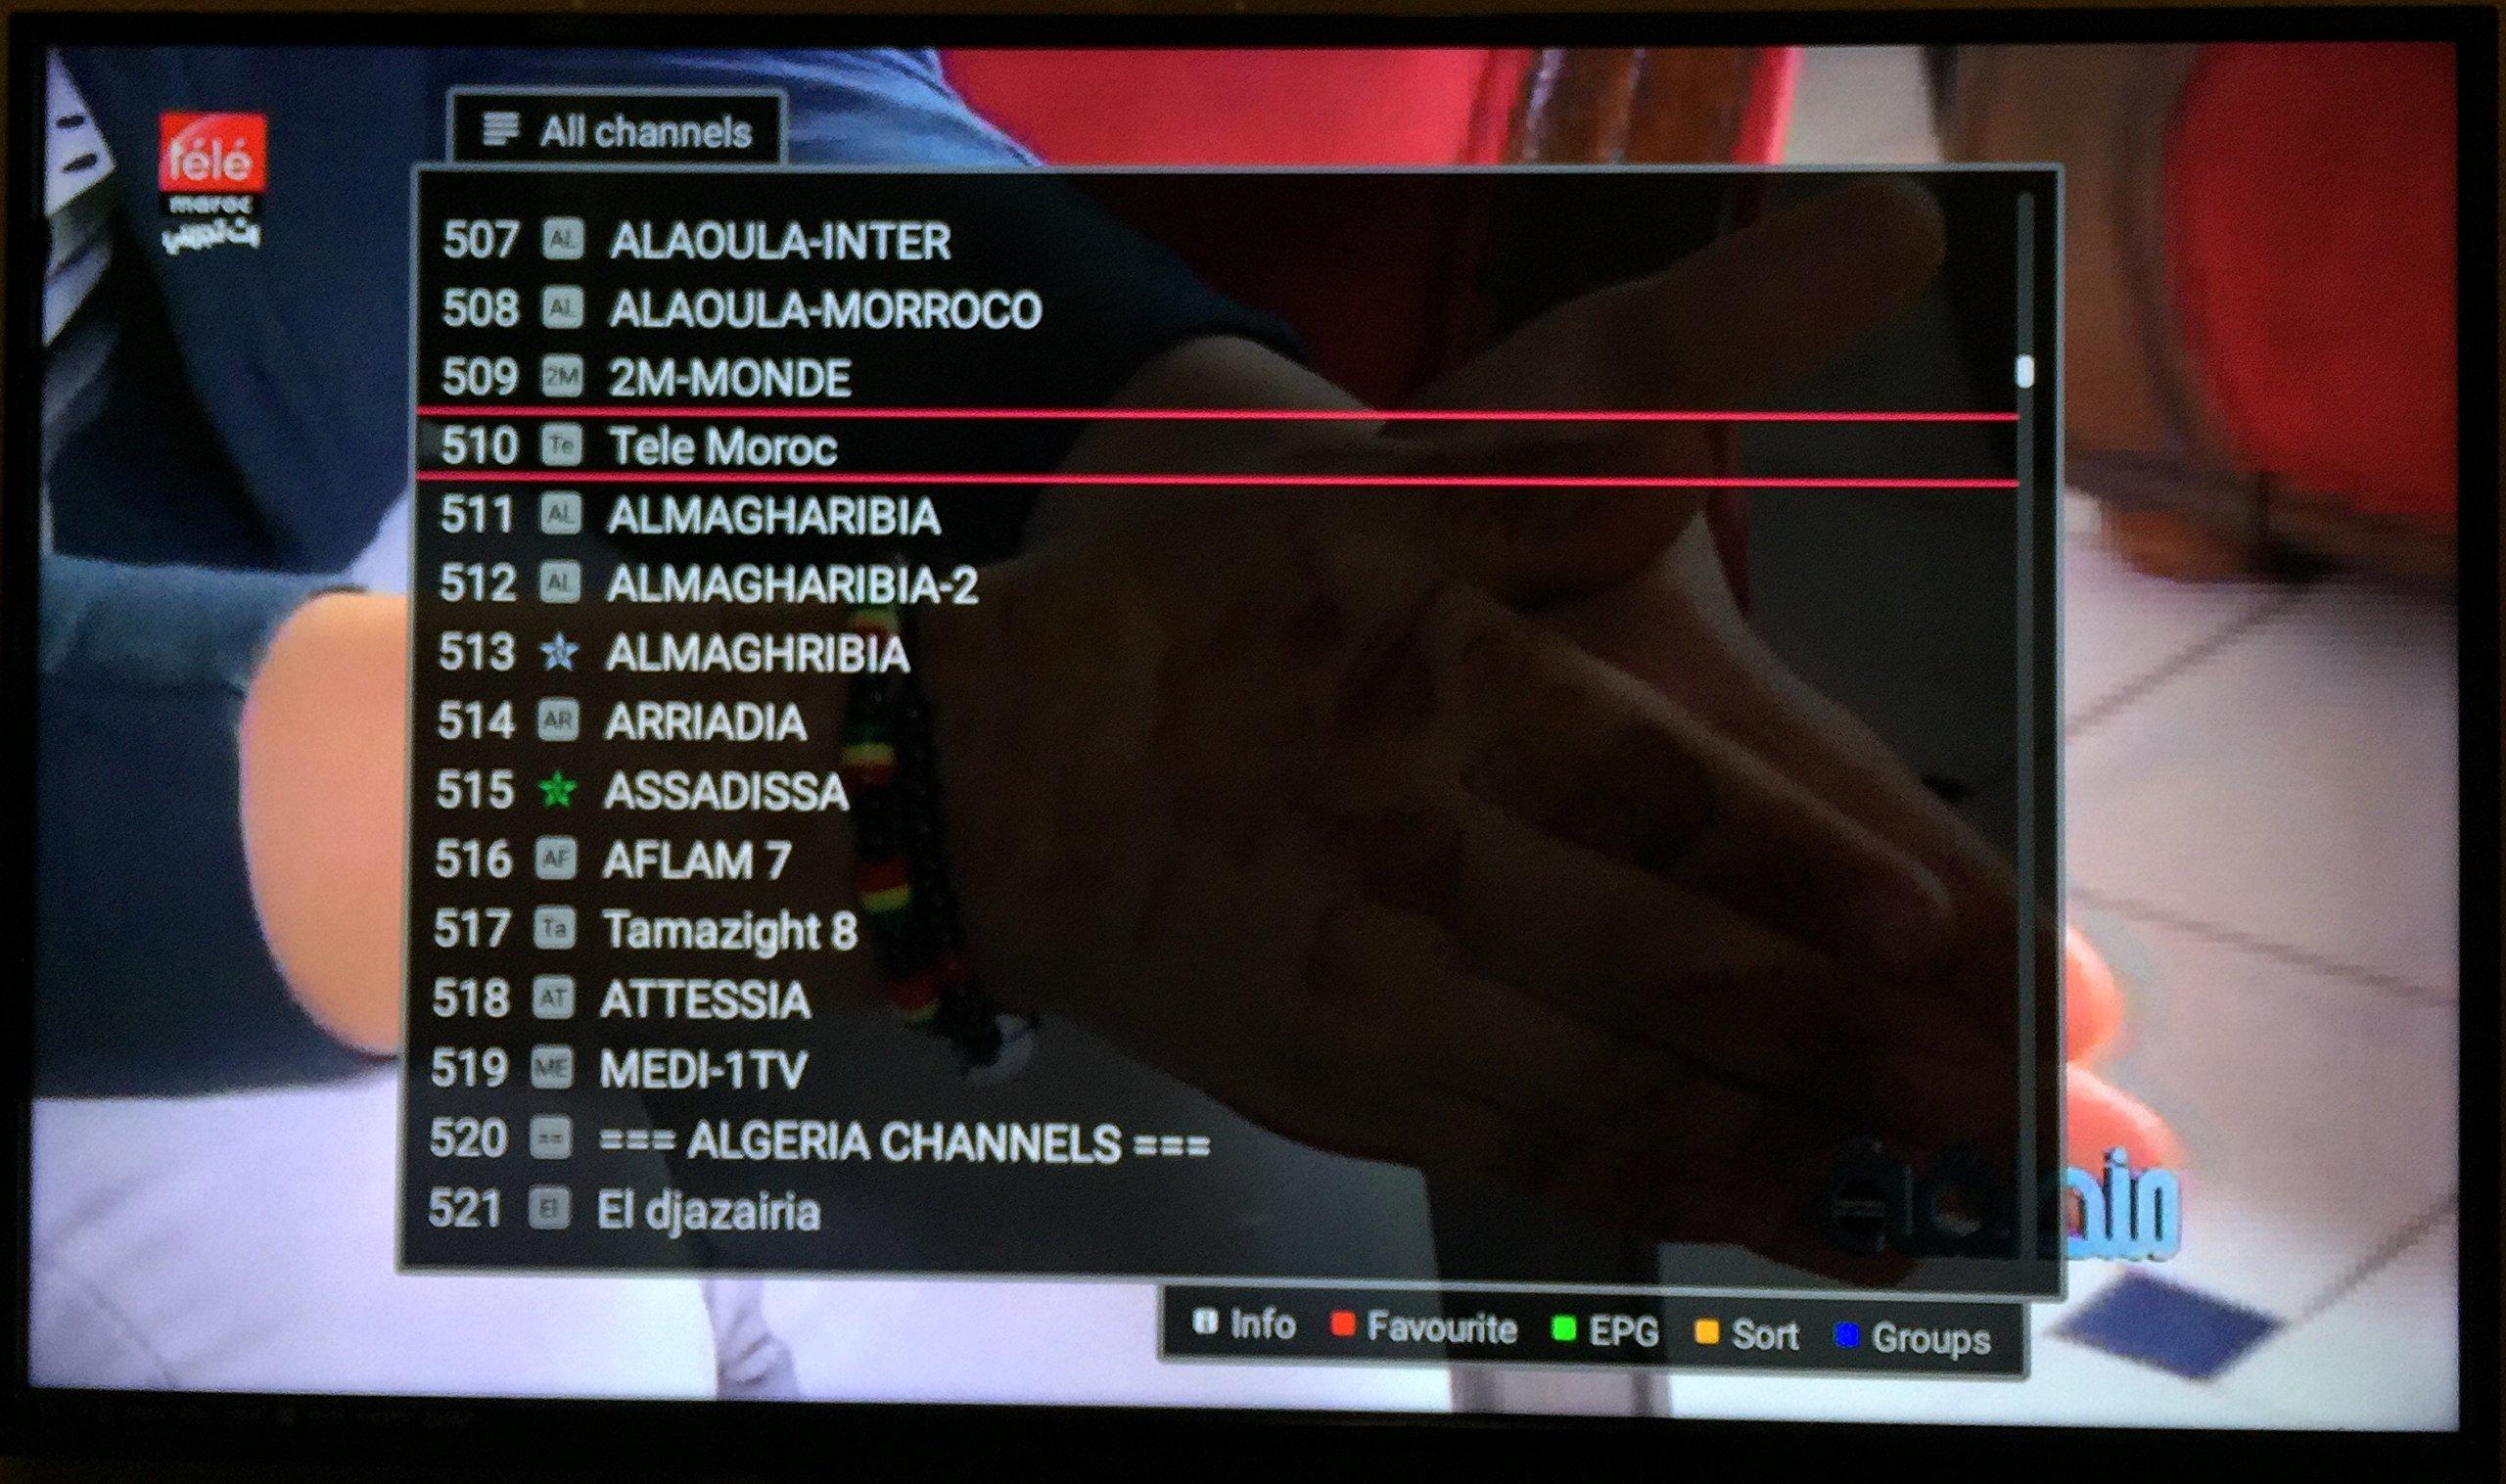 Arabia TV Super HD Receiver with 3000 Channel جهاز العائلة للقنواة العربية والعالمية (3000 Channel) by iptv+ (Image #4)